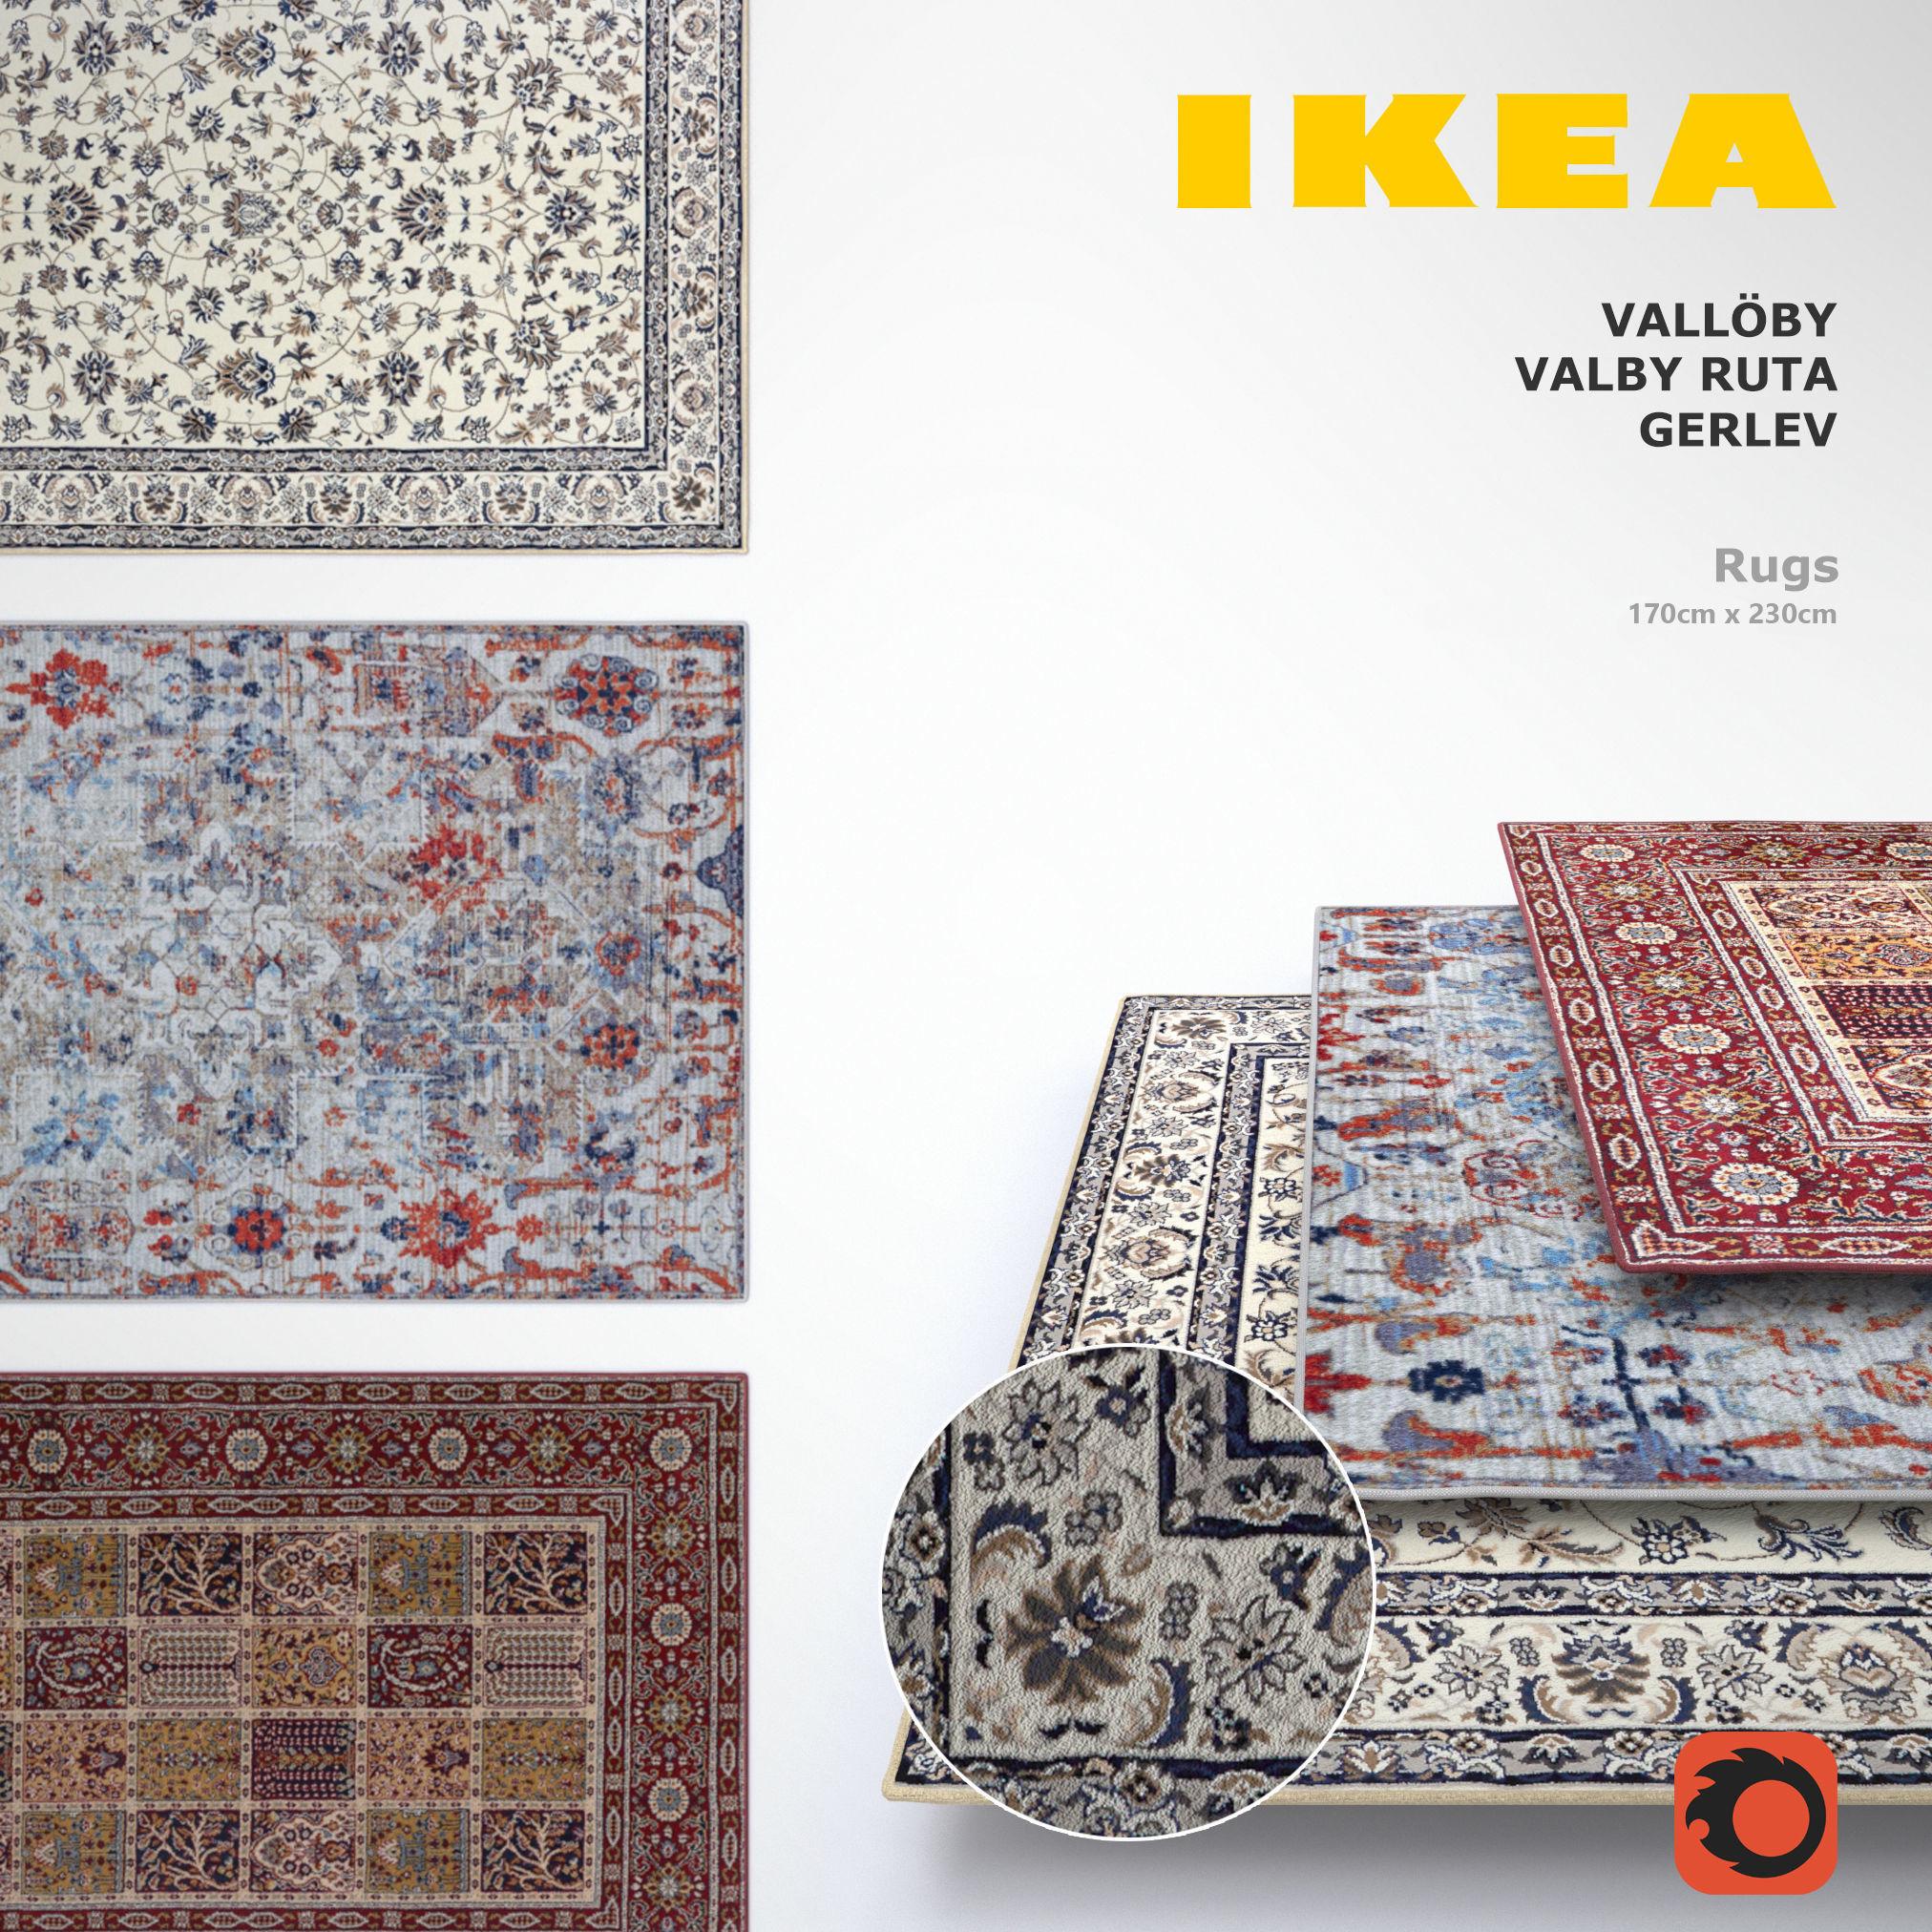 Ikea Rugs Set Et Cgtrader